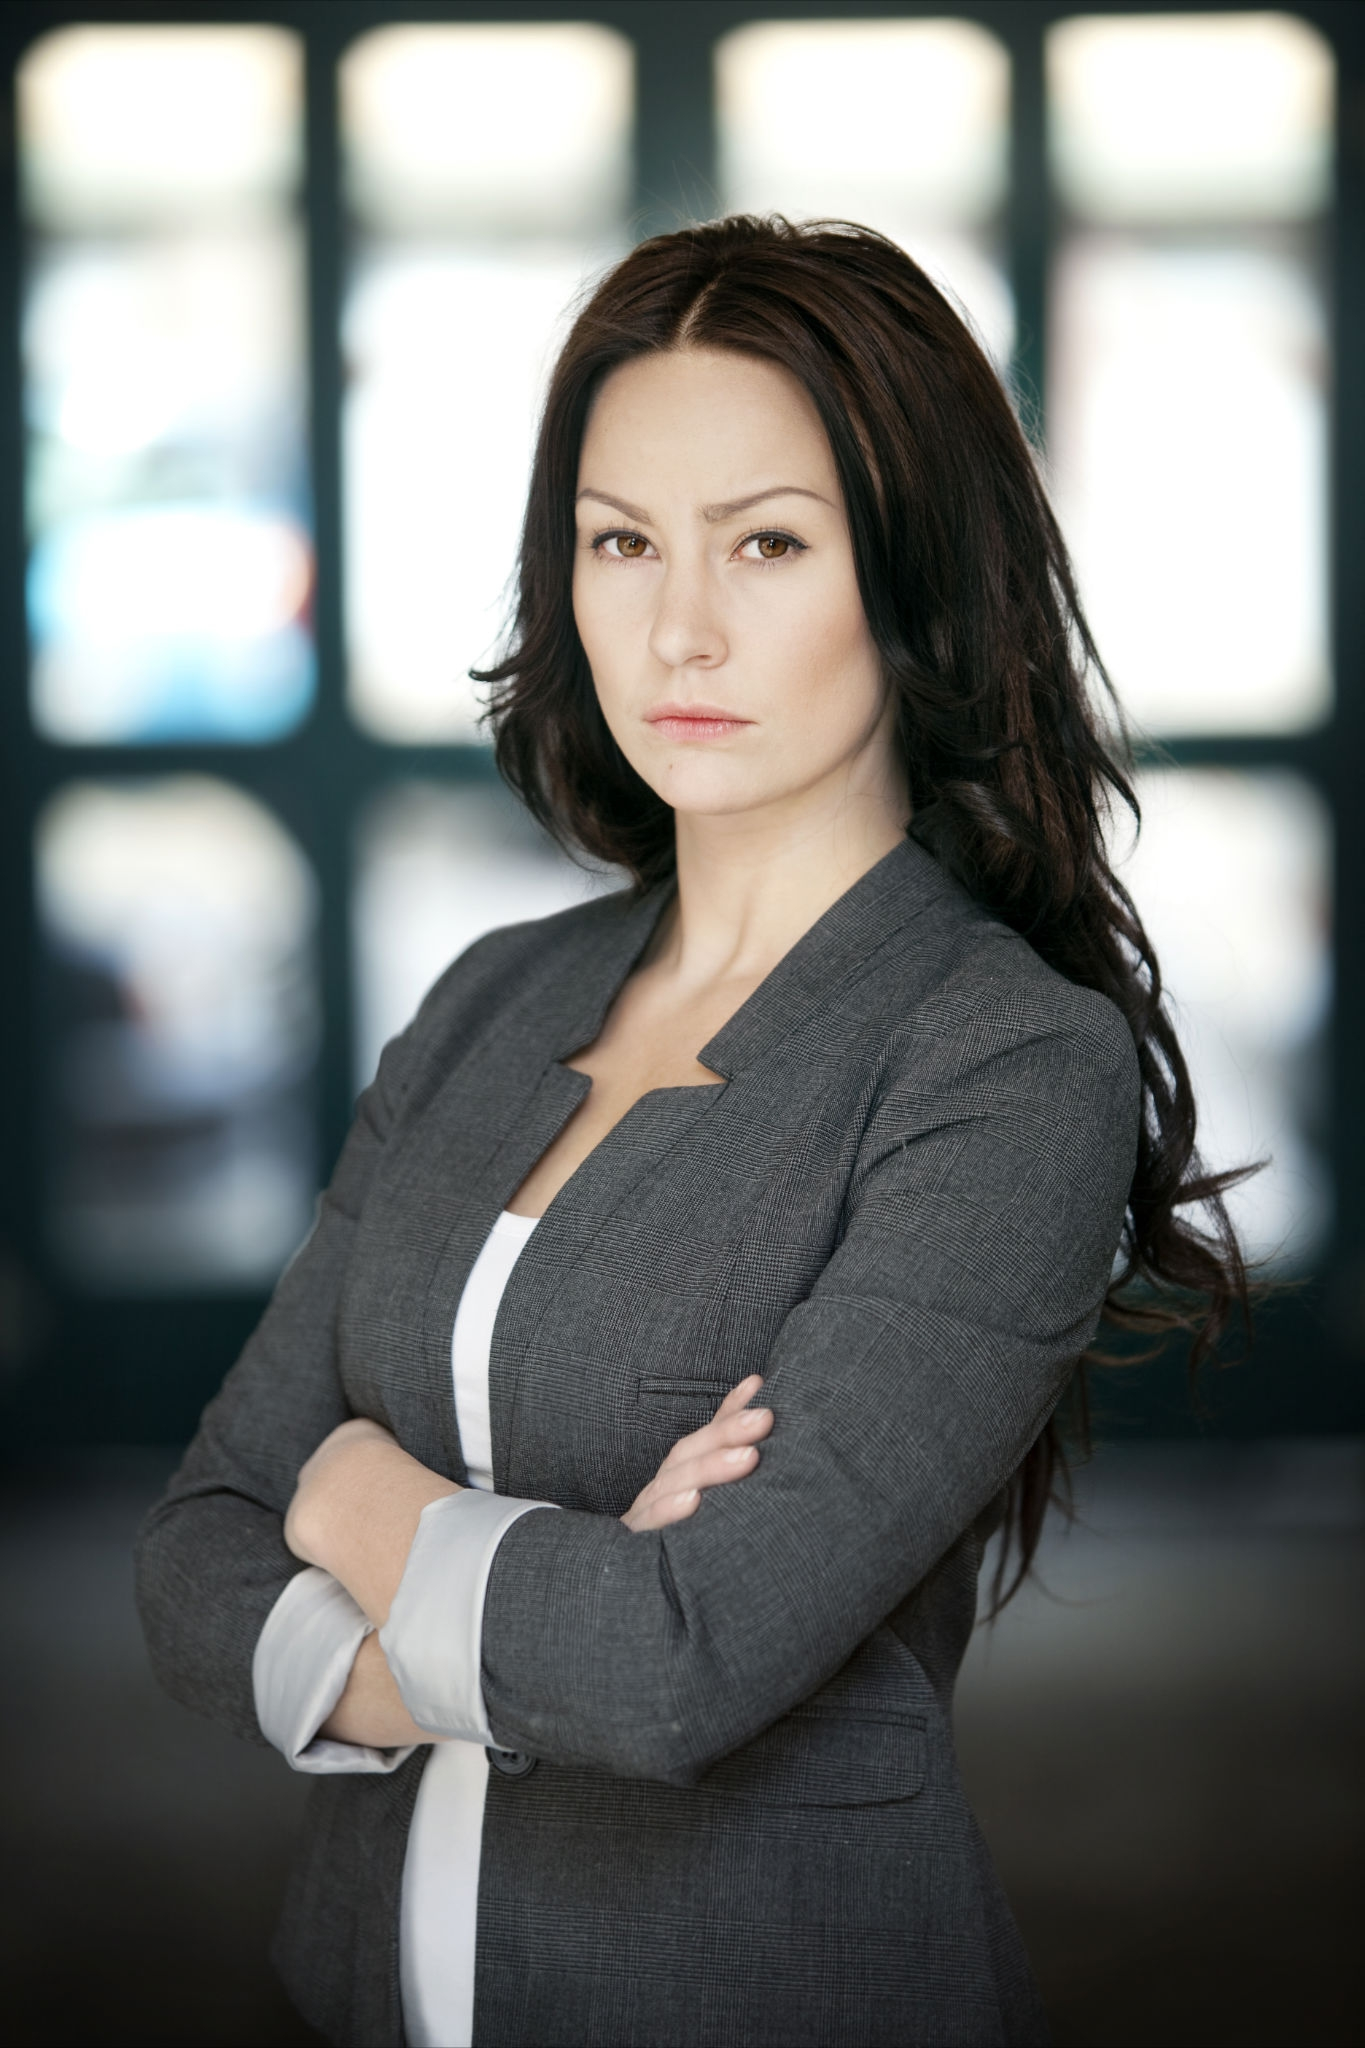 Actress, Fanny Rosen